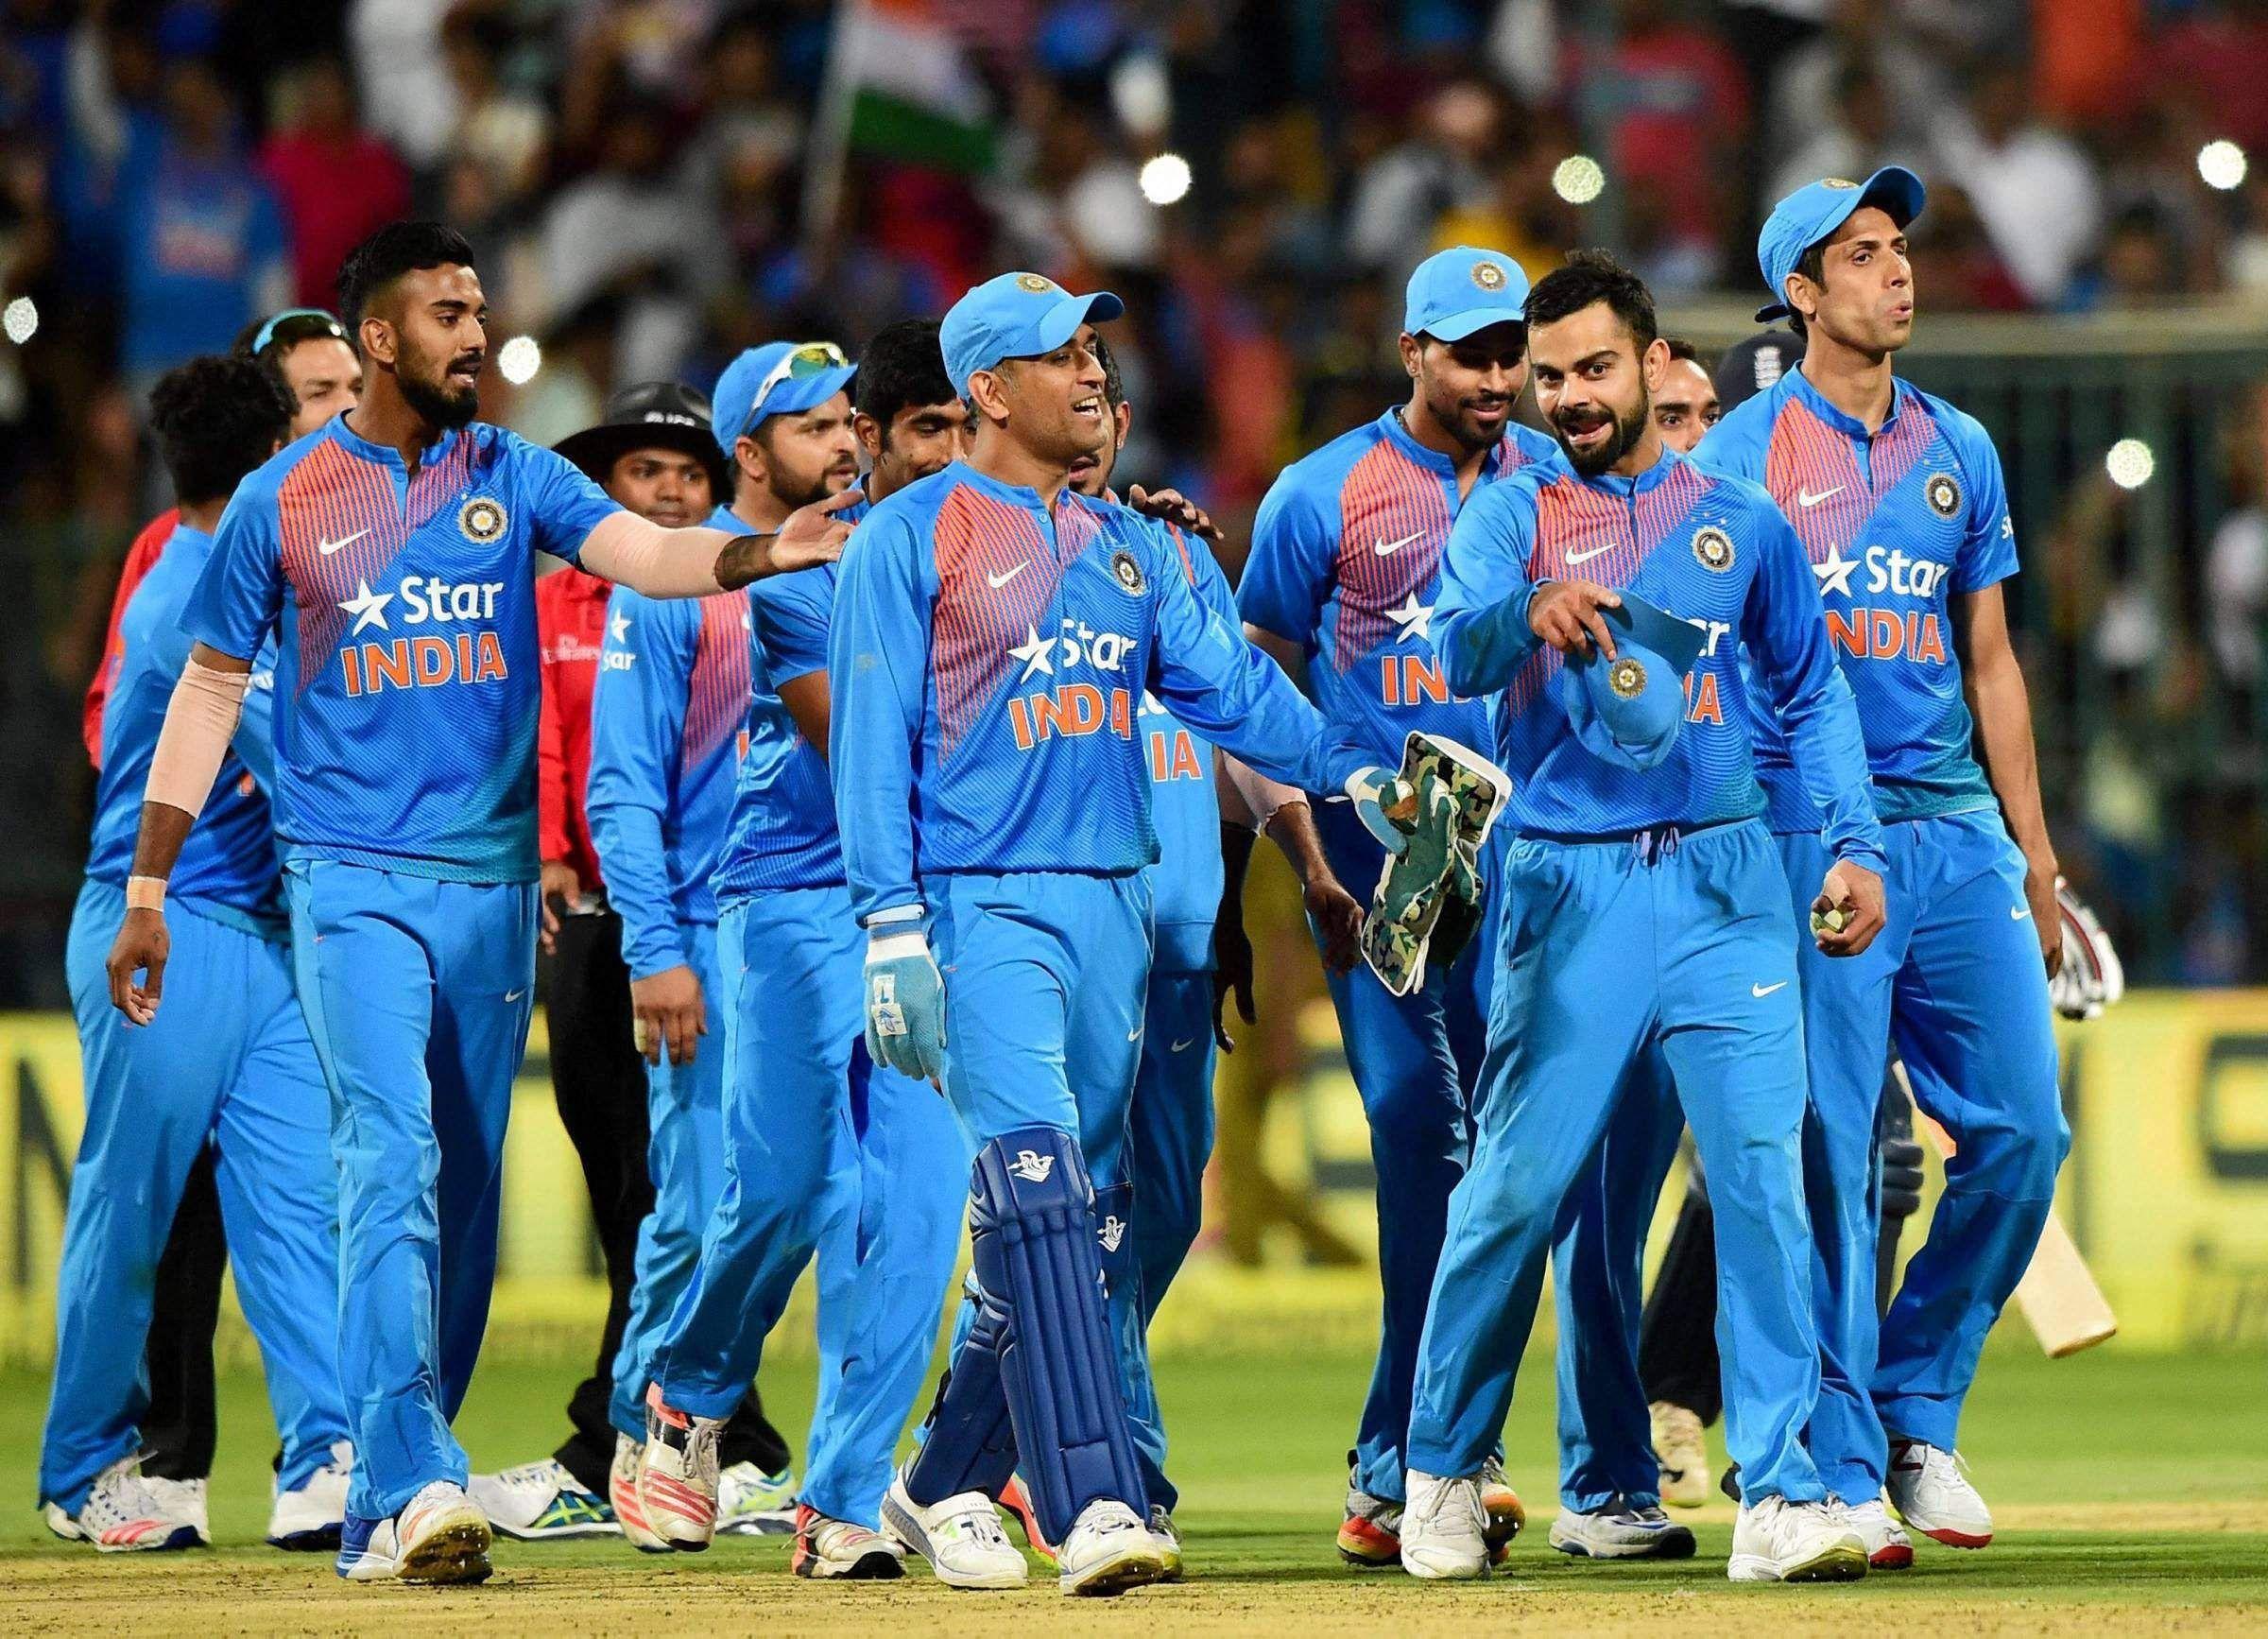 Indian Cricket Team Player Images Hd Cricket Teams India Cricket Team Team Fashion